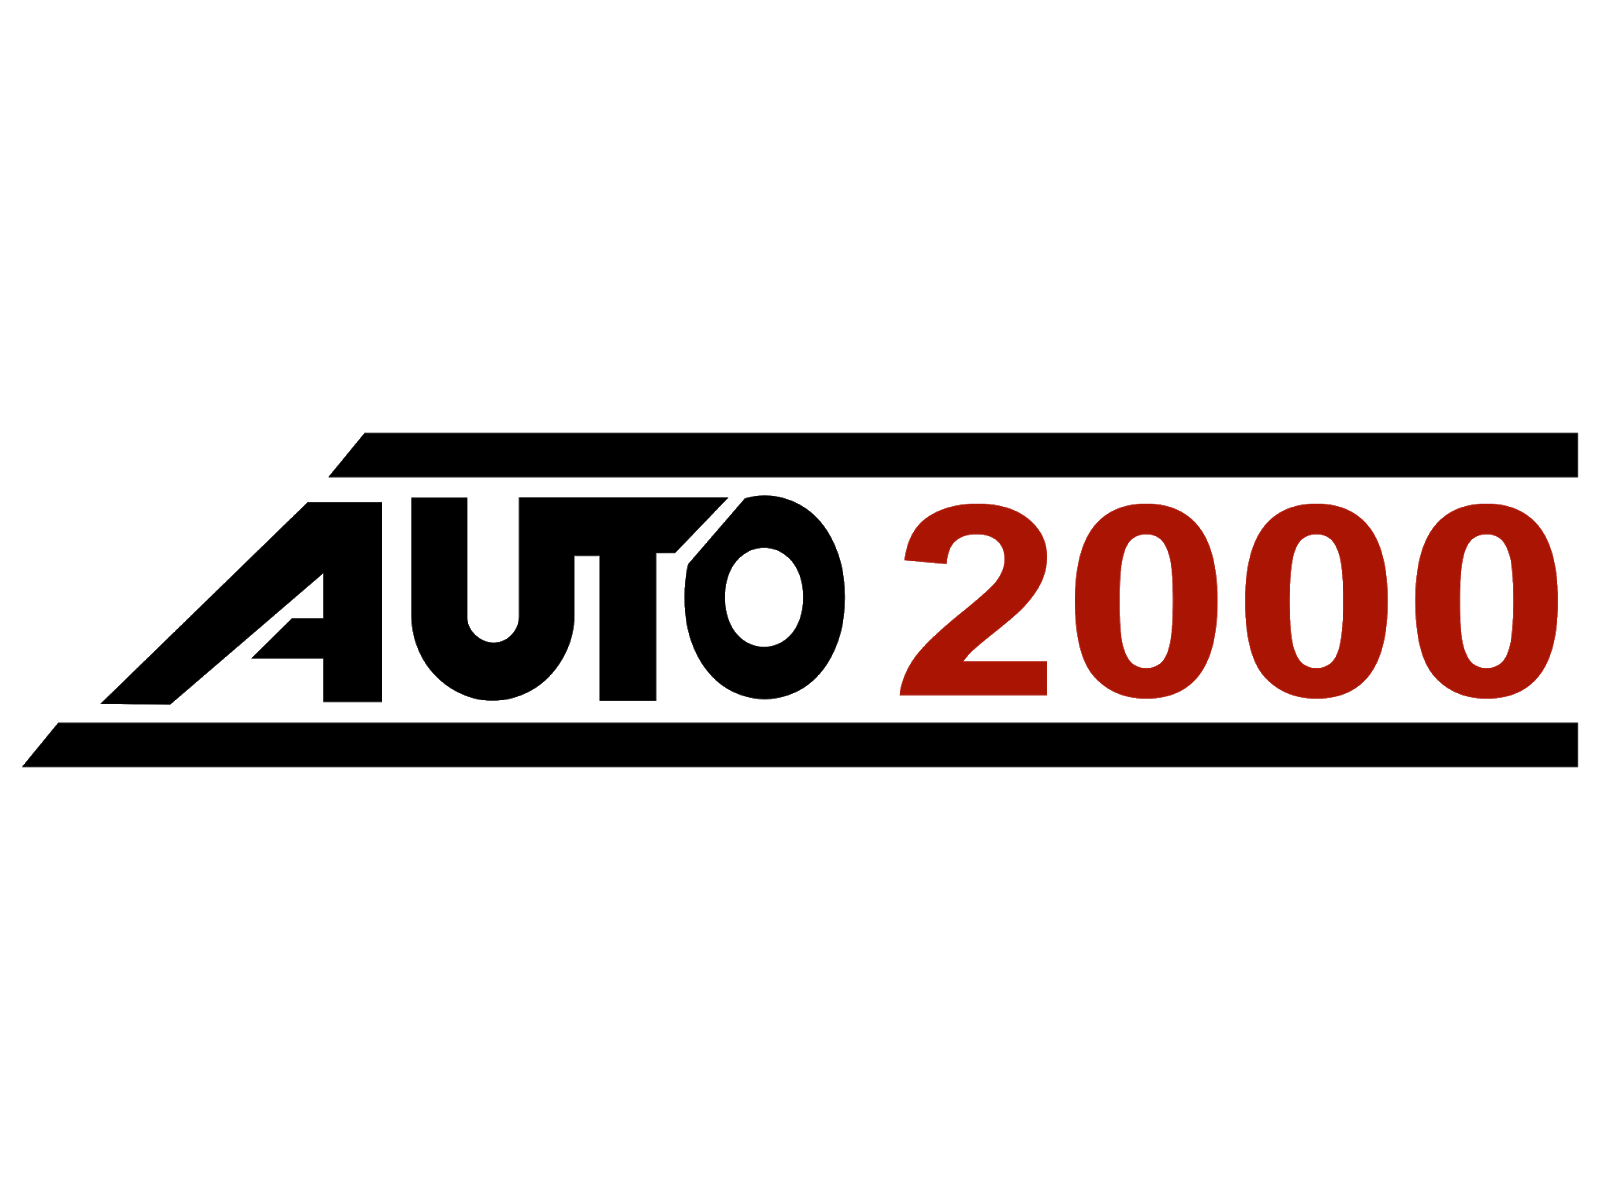 Logo Auto 2000 Vector Cdr Png Hd Gudril Logo Tempat Nya